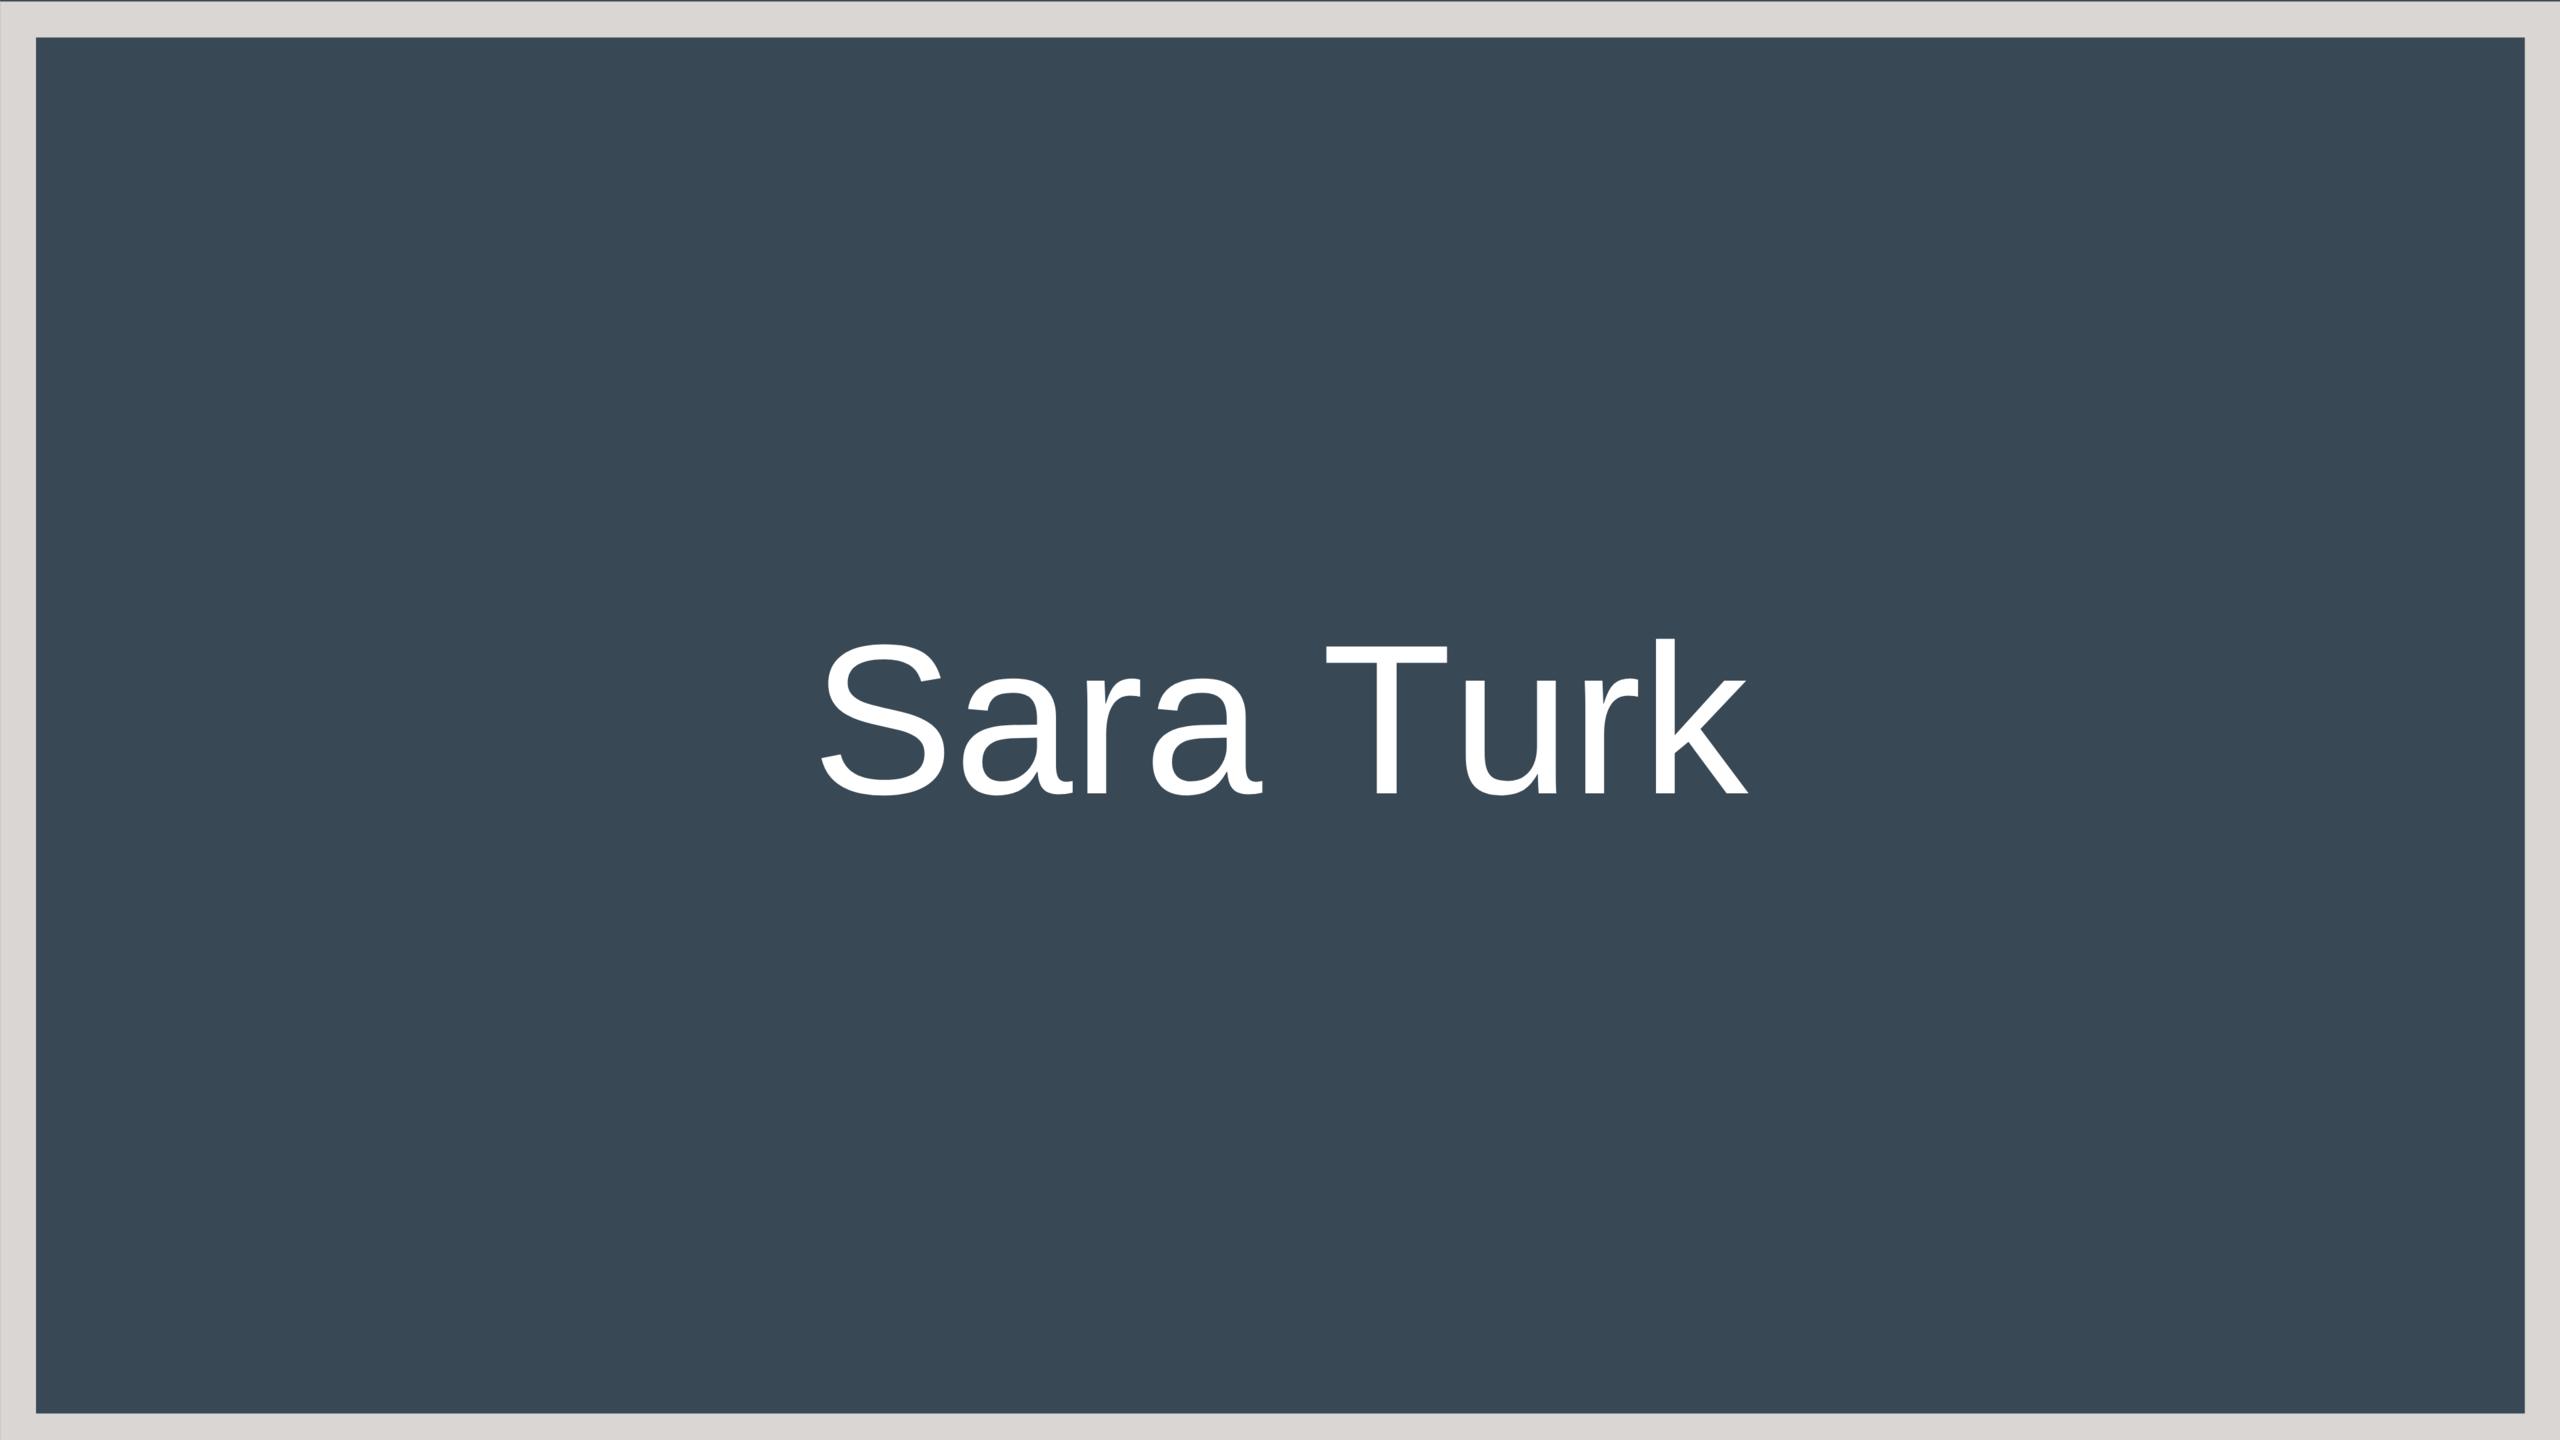 Sara Turk